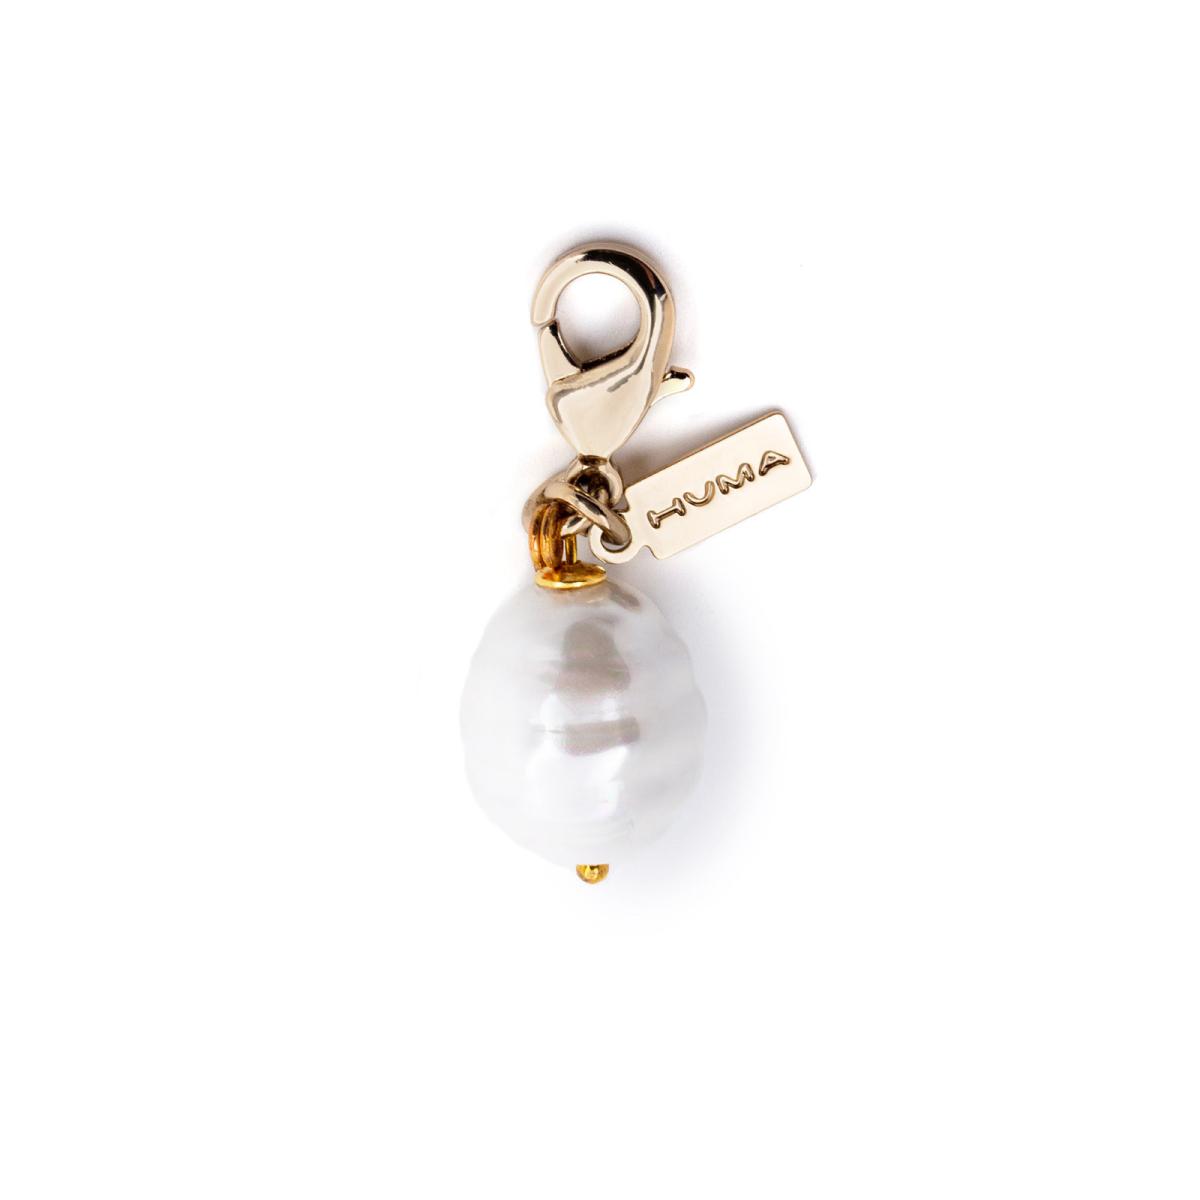 Huma® Accessories: Earring River Pearl color Gold E21.